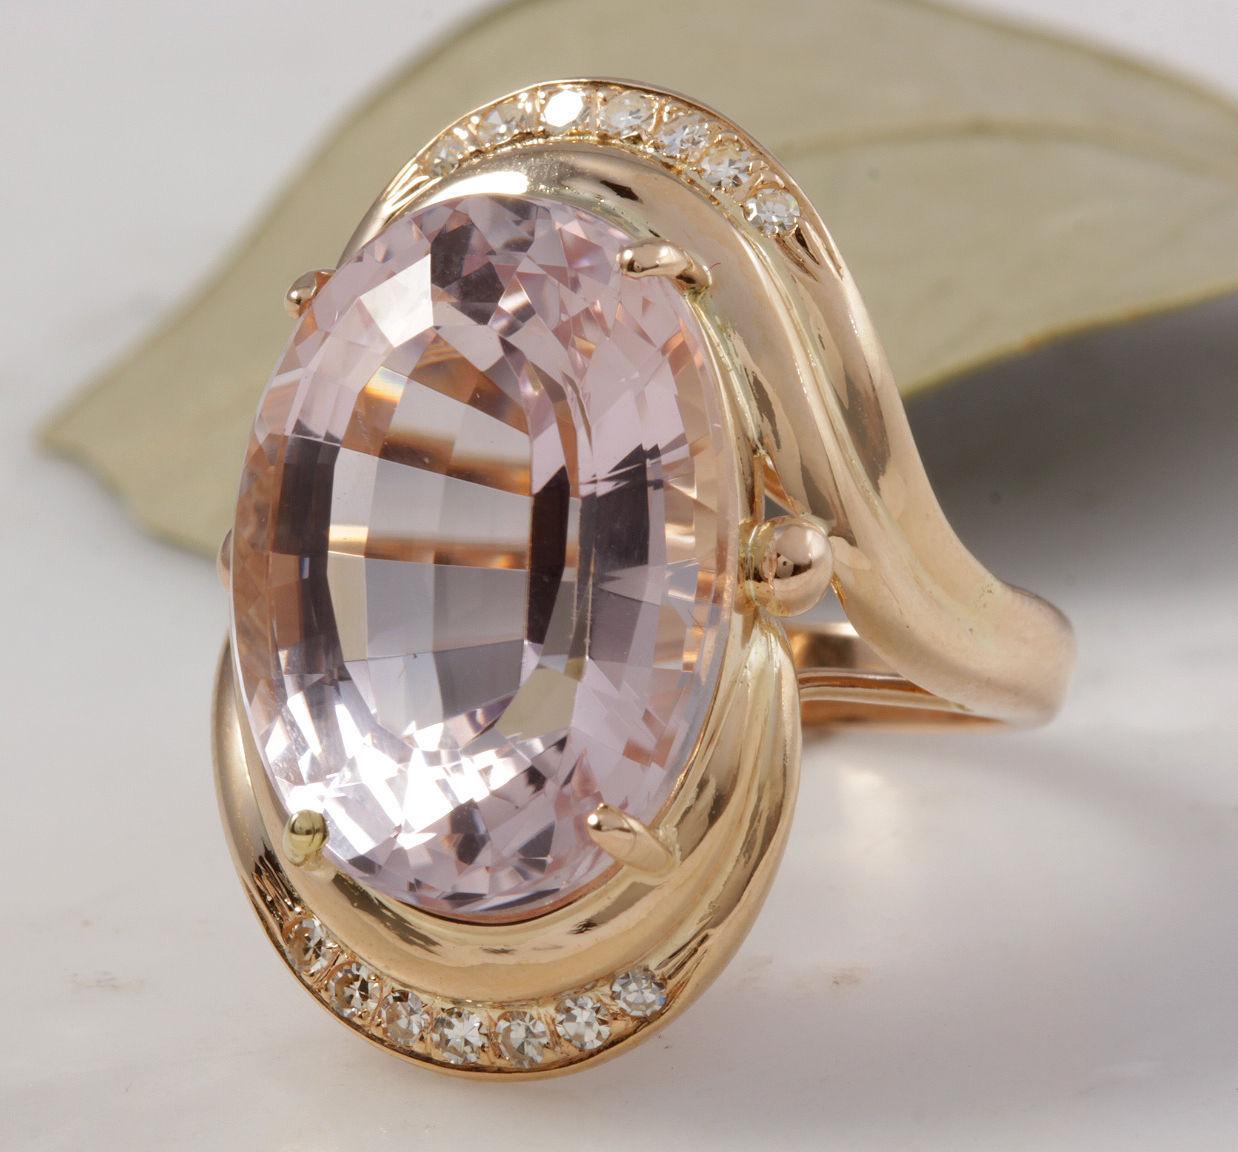 Estate 16.18 Carats Natural Pink Kunzite and Diamond 14K Solid Rose Gold Ring